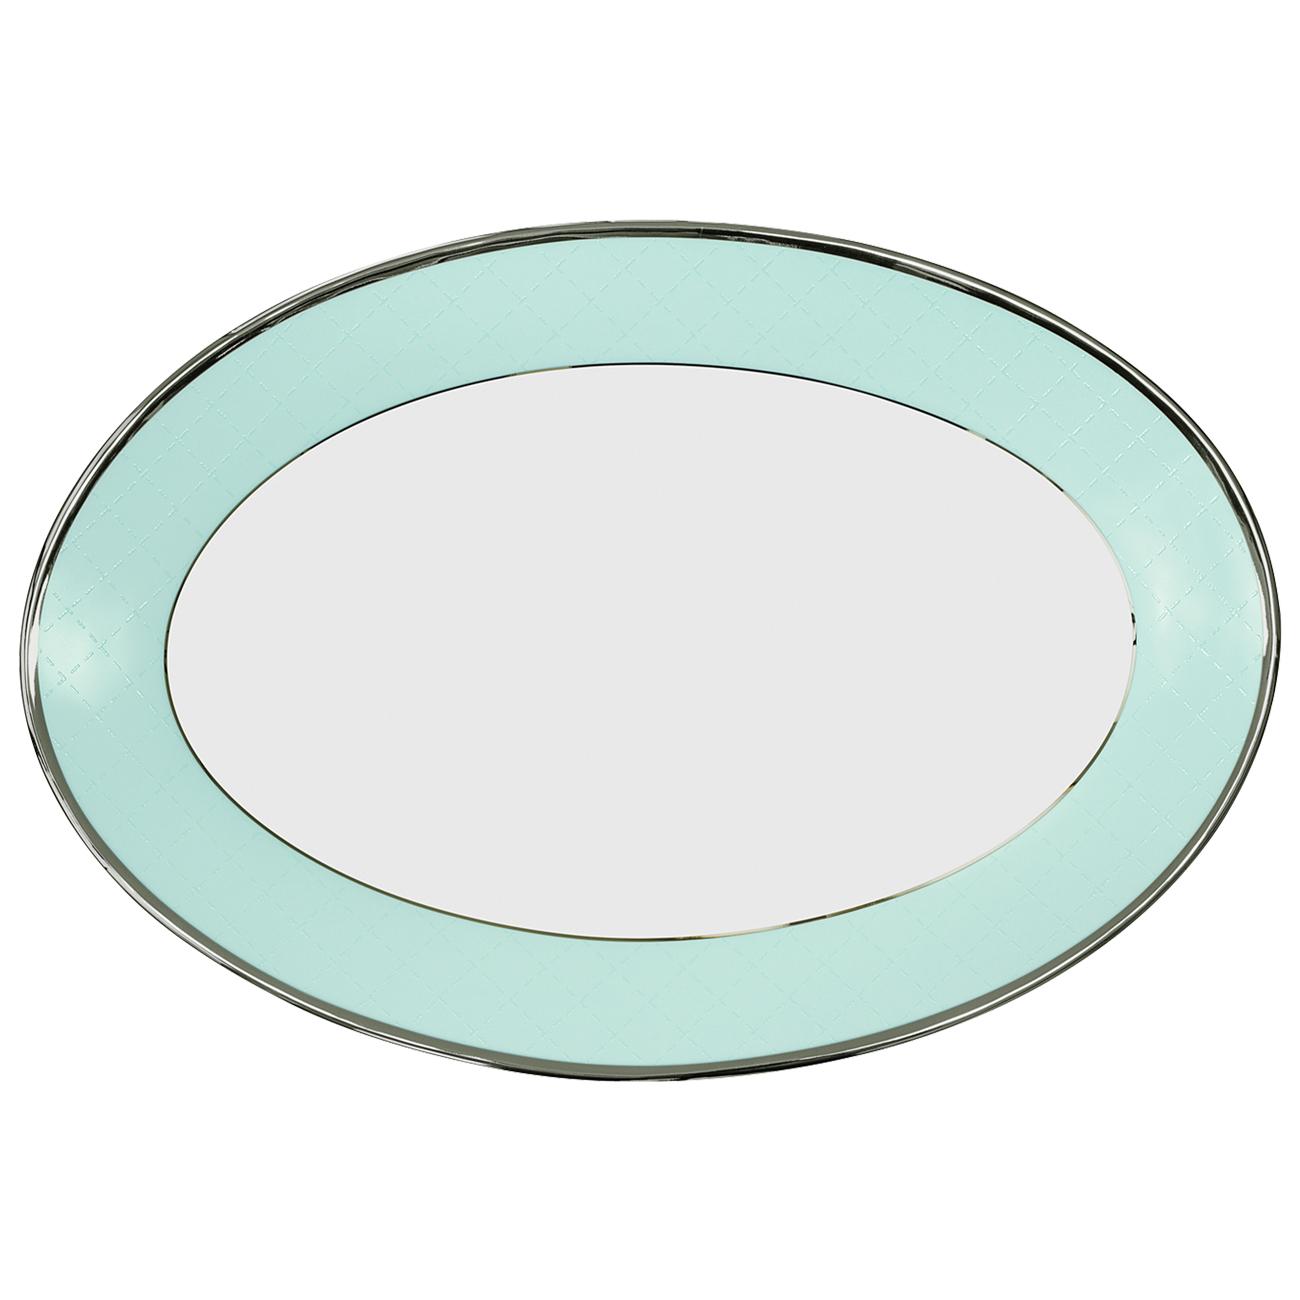 Travessa Oval 39cm Myth 0